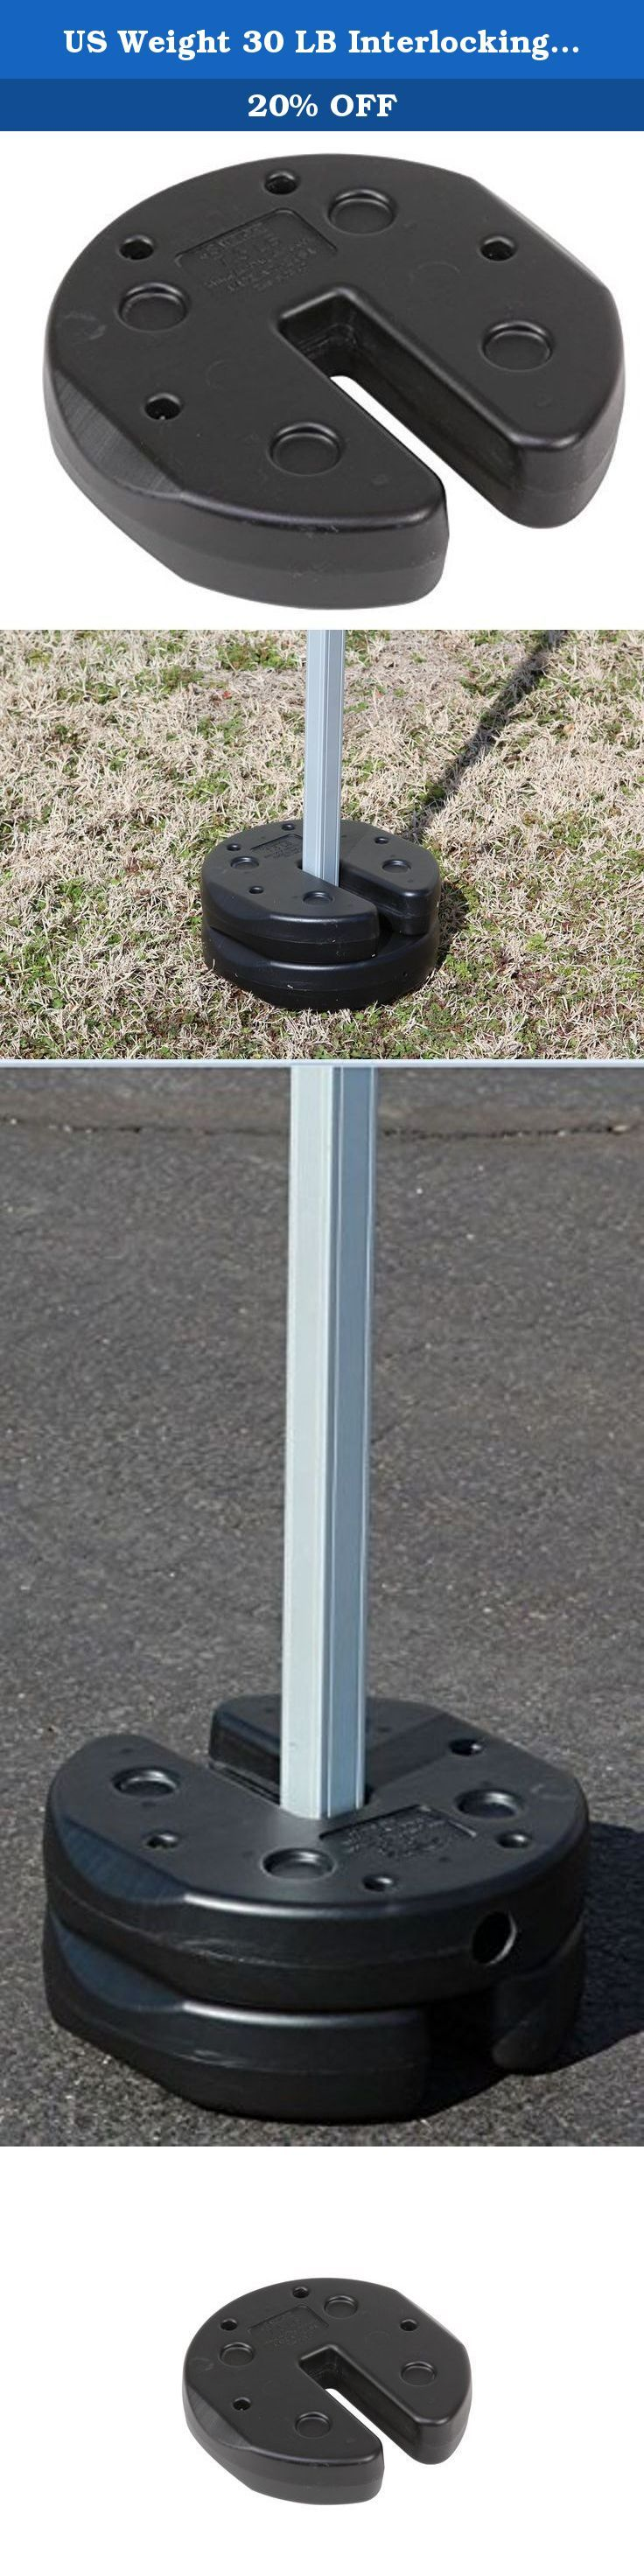 Us Weight 30 Lb Interlocking Canopy Weights Set Of 4 7 5 Lb